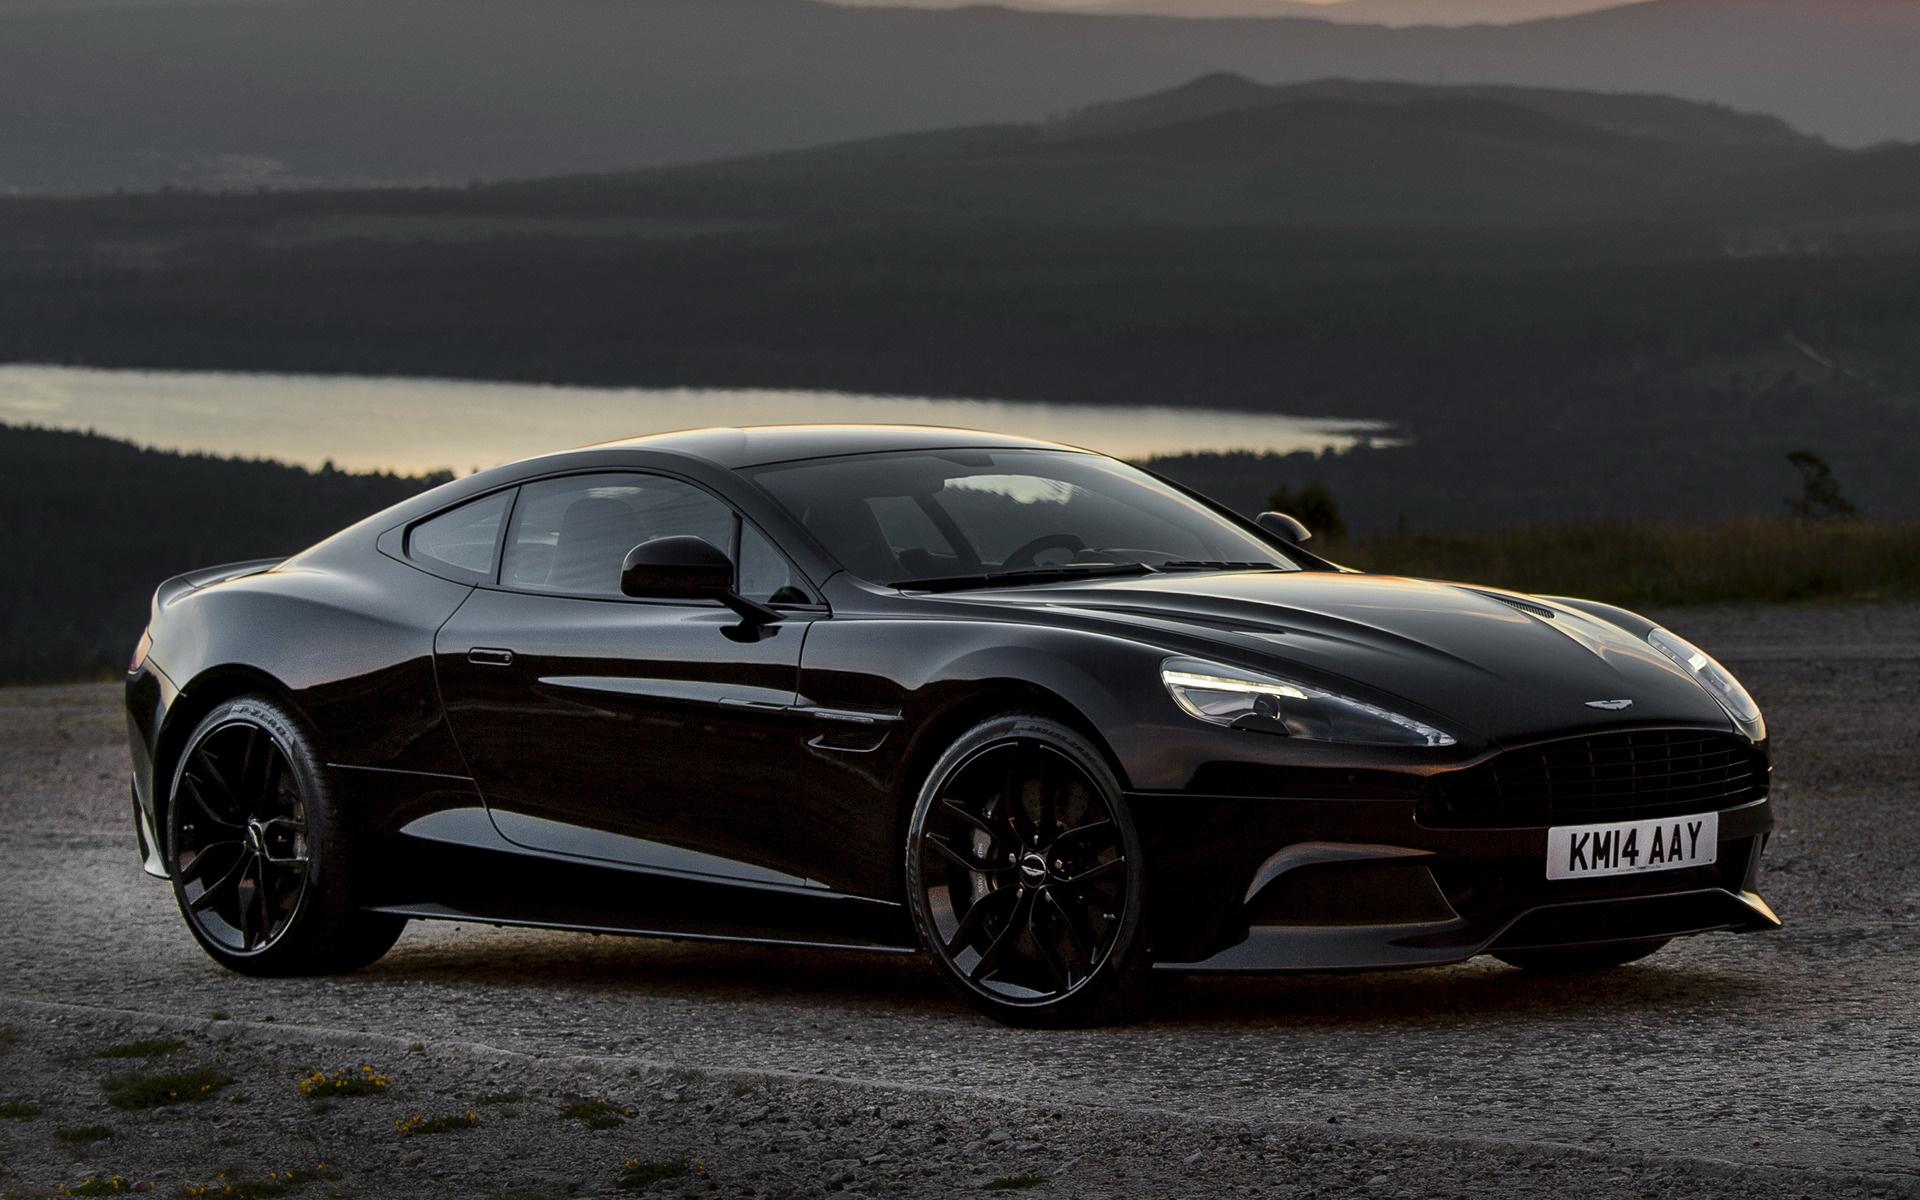 Aston Martin Vanquish Carbon Black Wallpapers And HD Images - Aston martin vanquish black